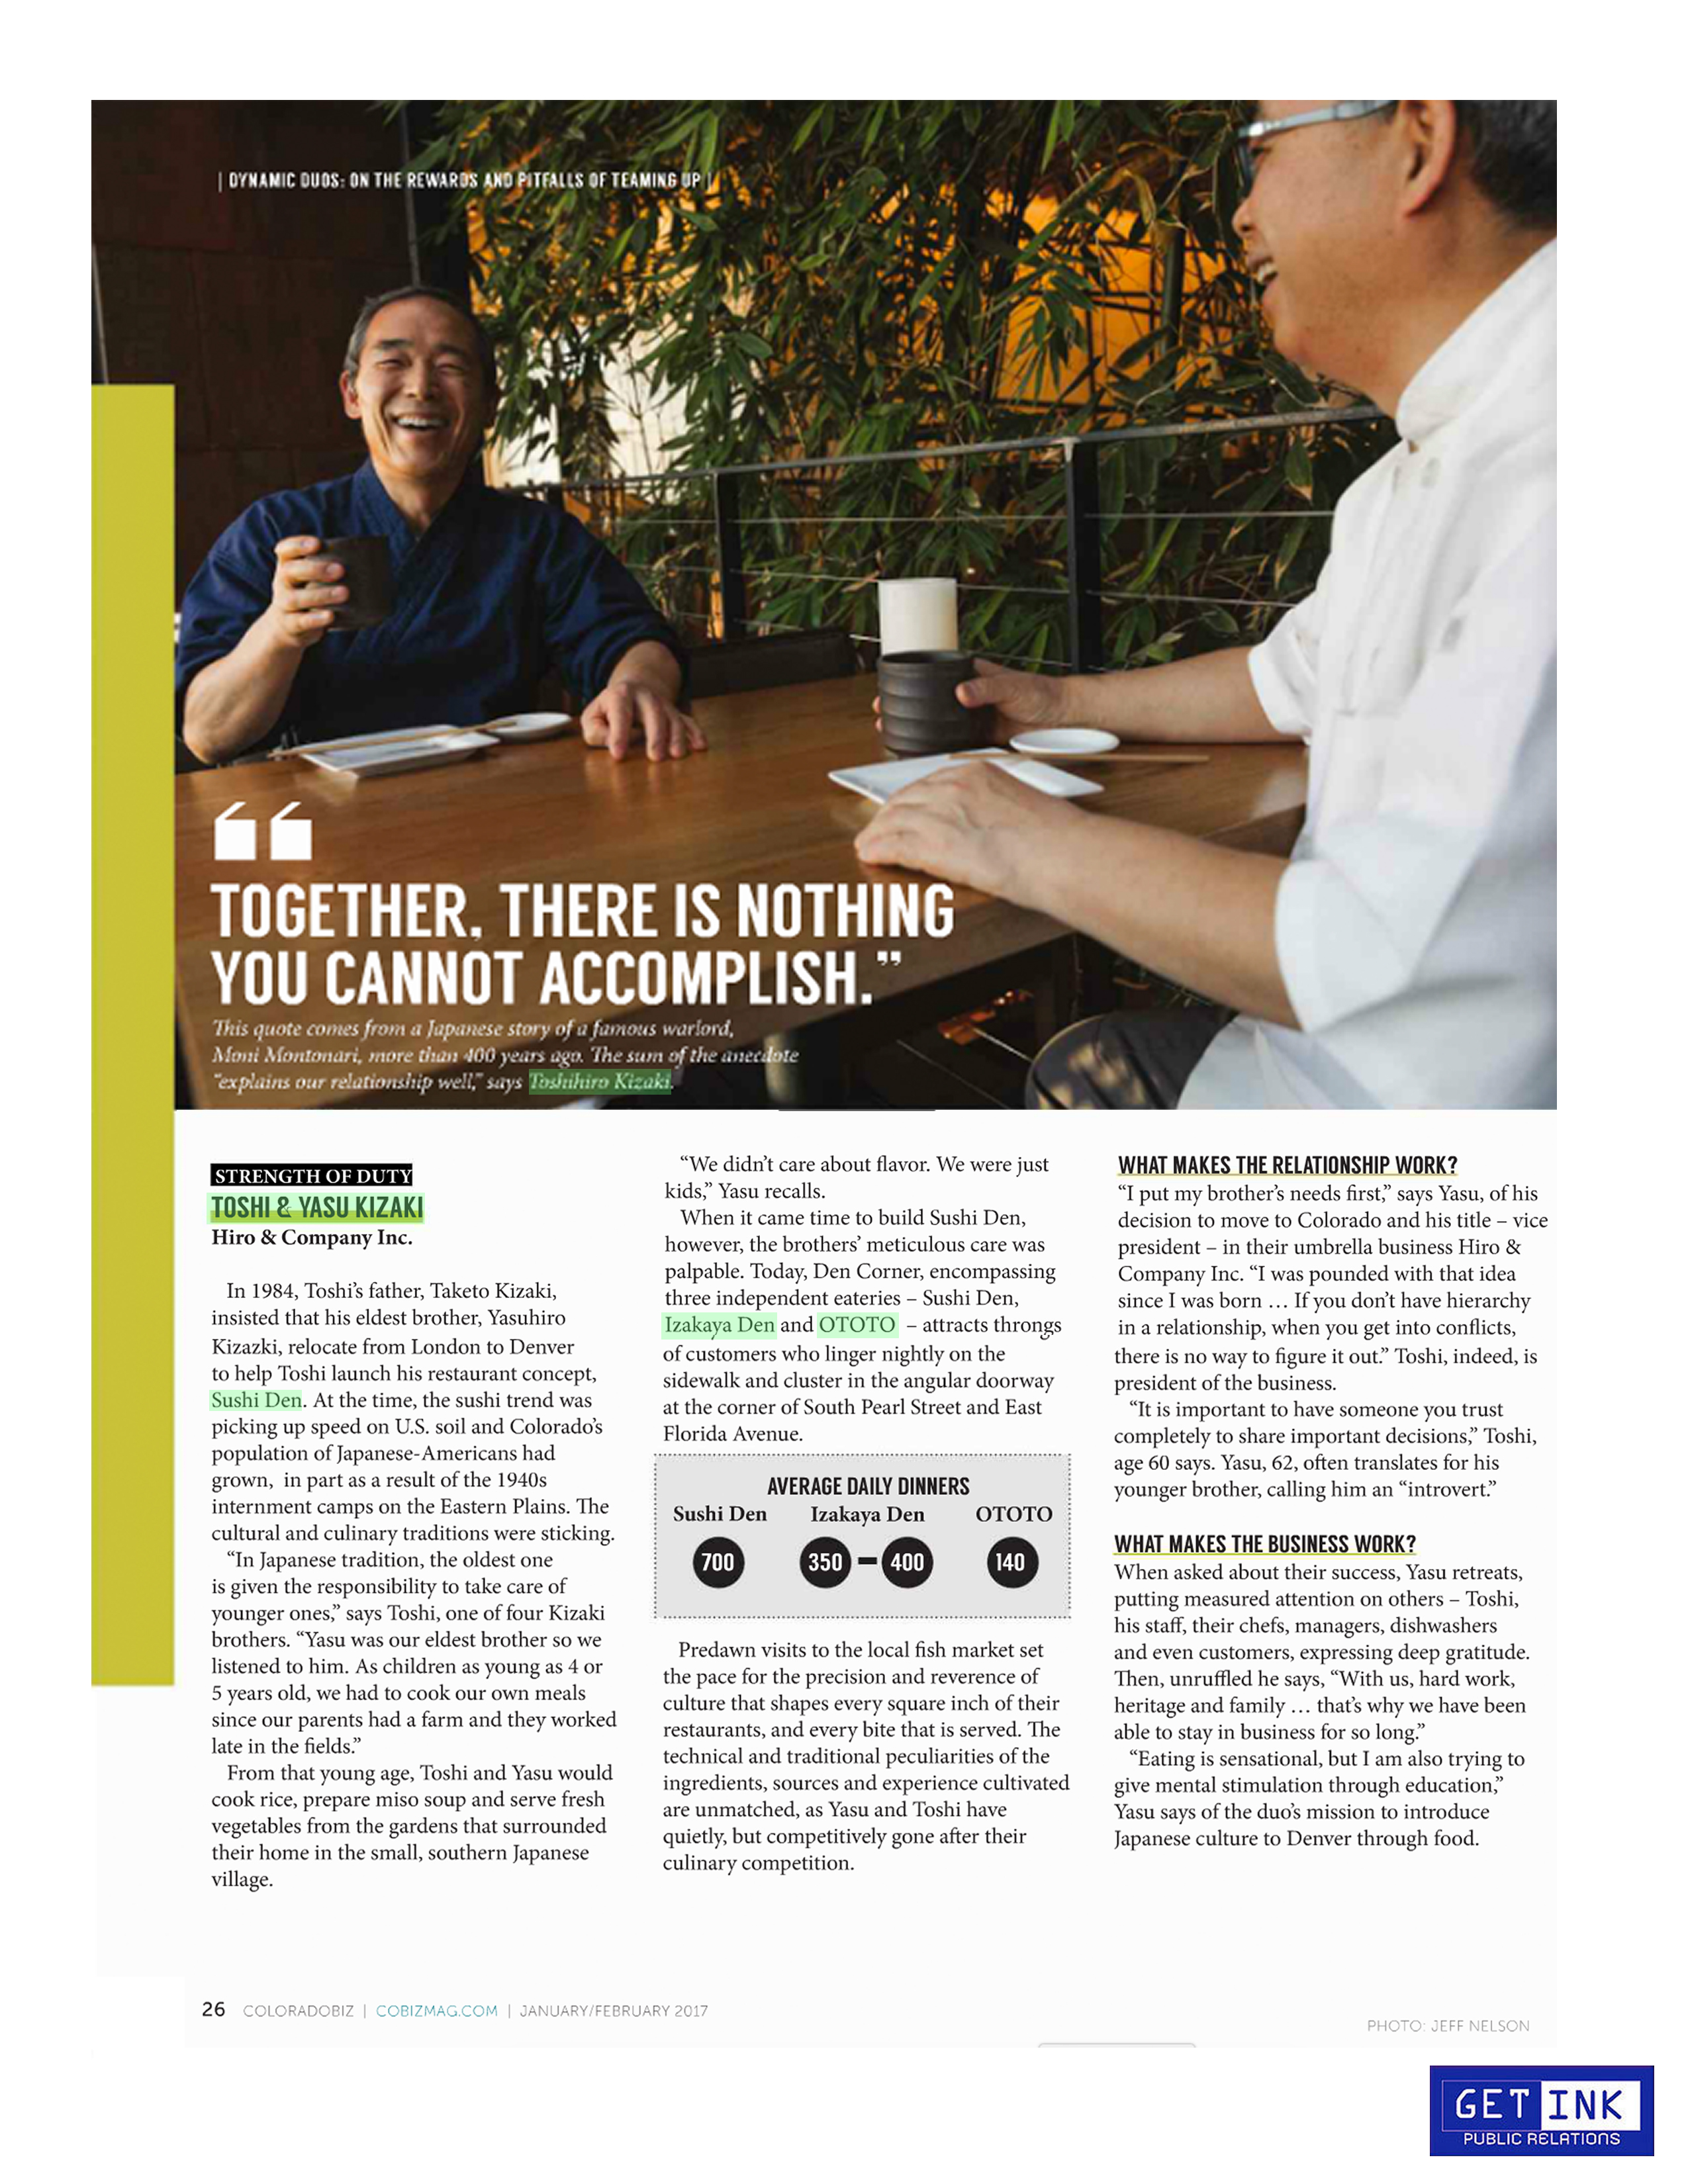 Toshi and Yasu Kizaki Sushi Den Denver in Colorado Business Journal 2017 - Get Ink PR